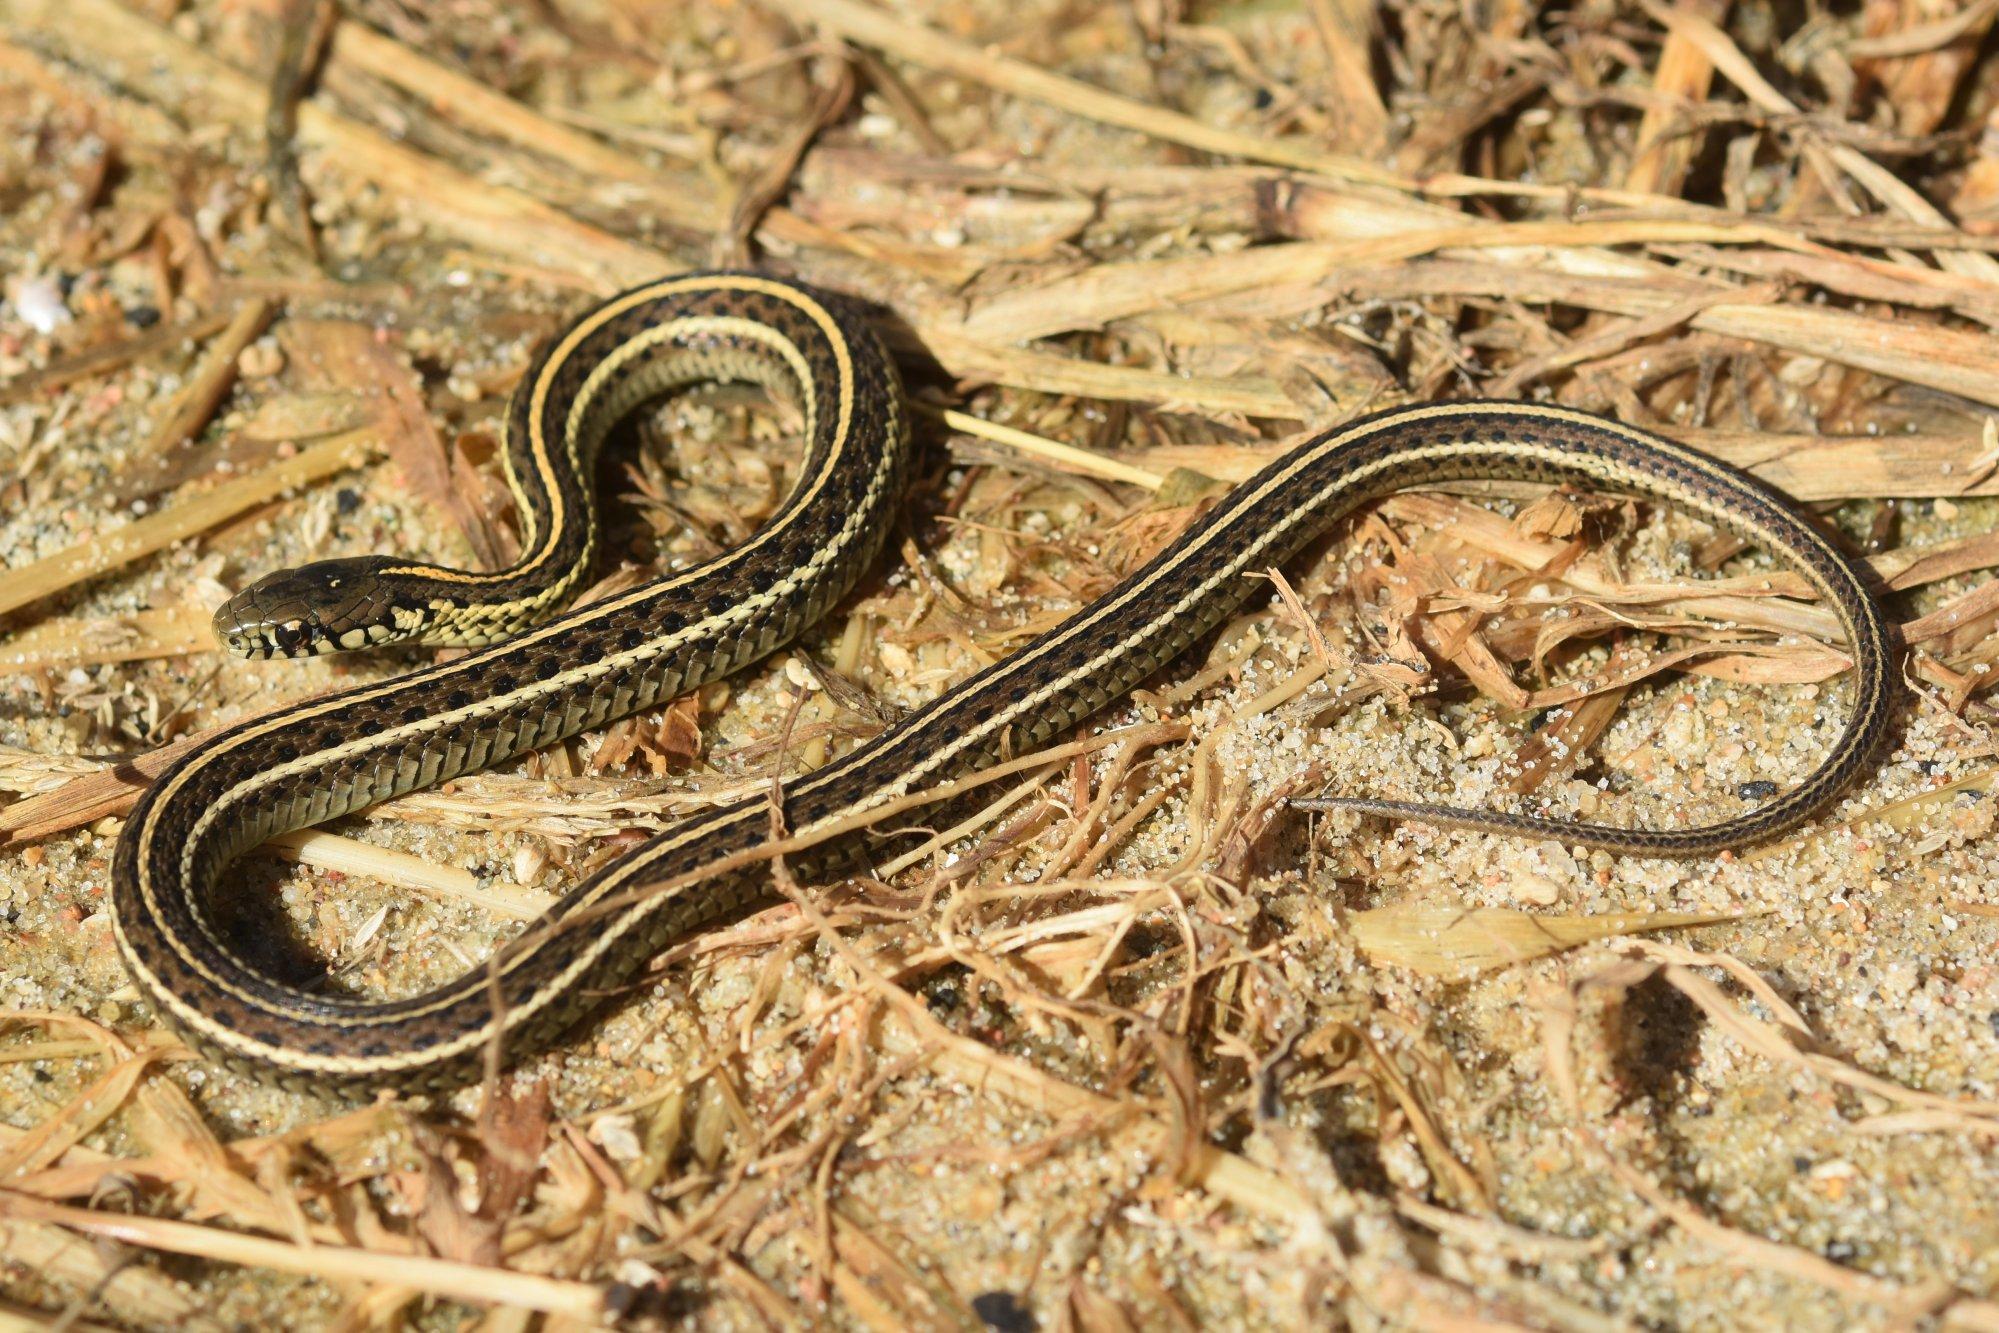 Plains Gartersnake (Thamnophis radix) - Amphibians and